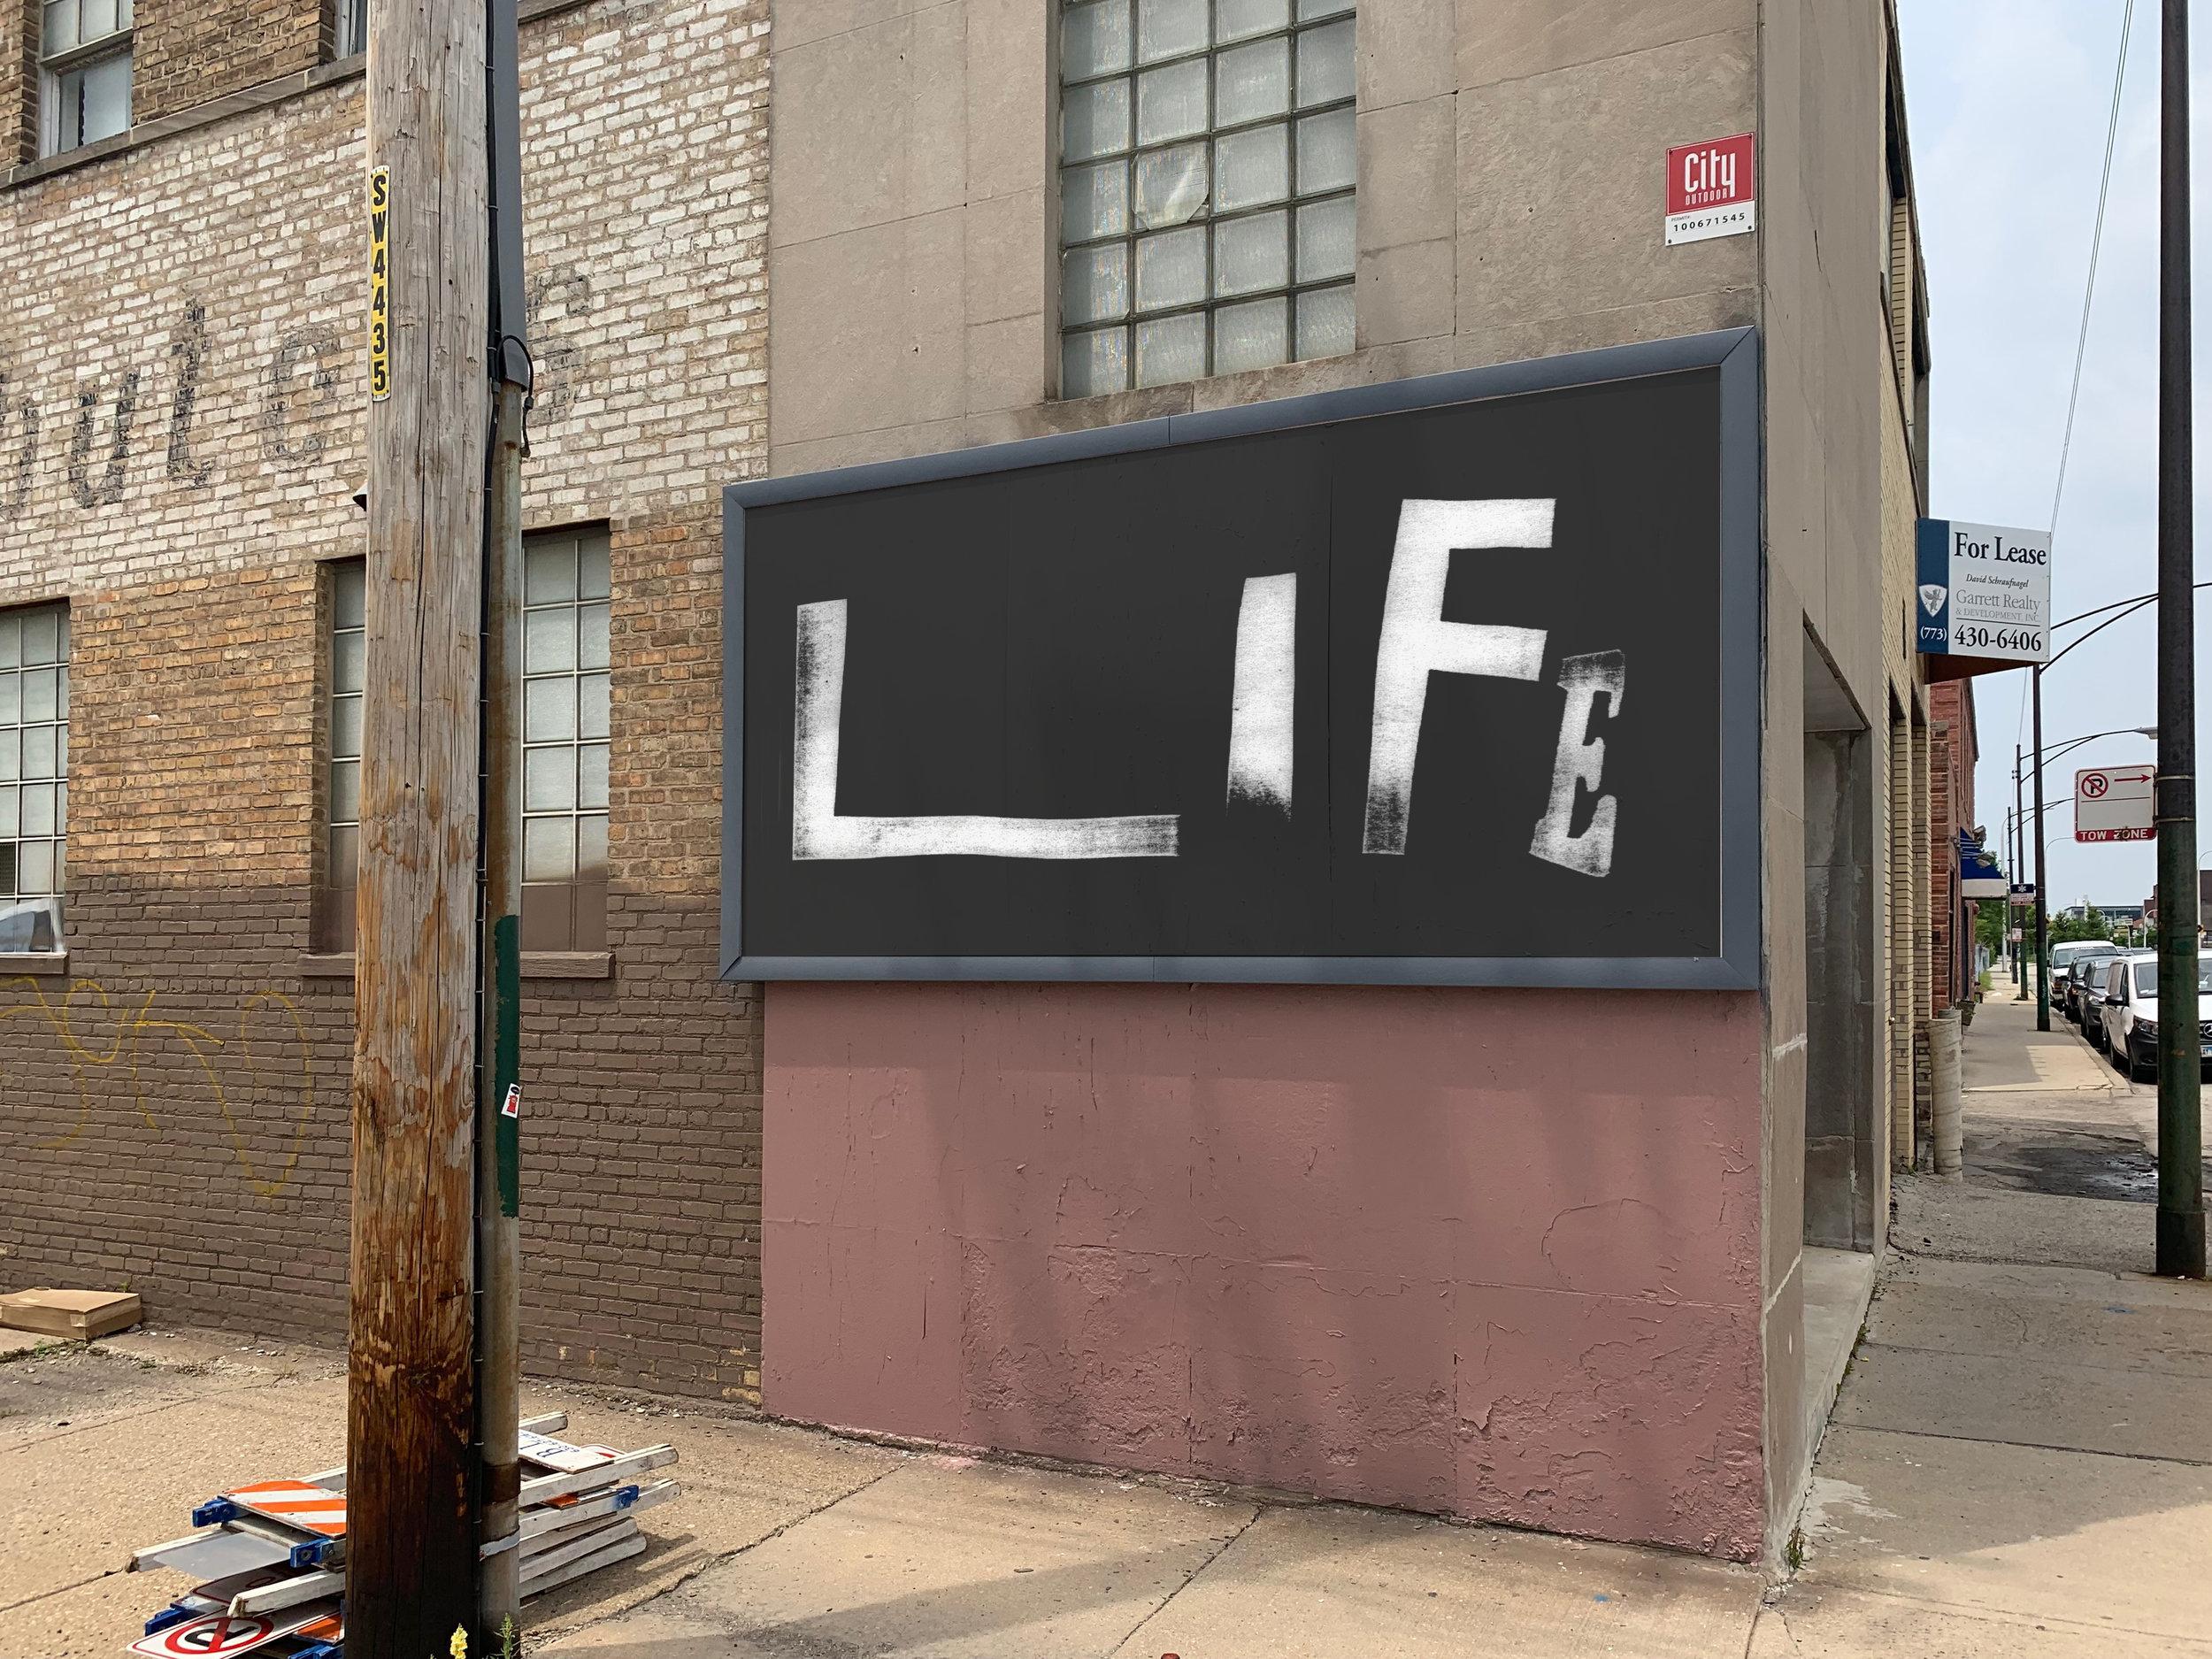 LIFE_elston_board_3_4032w.jpg